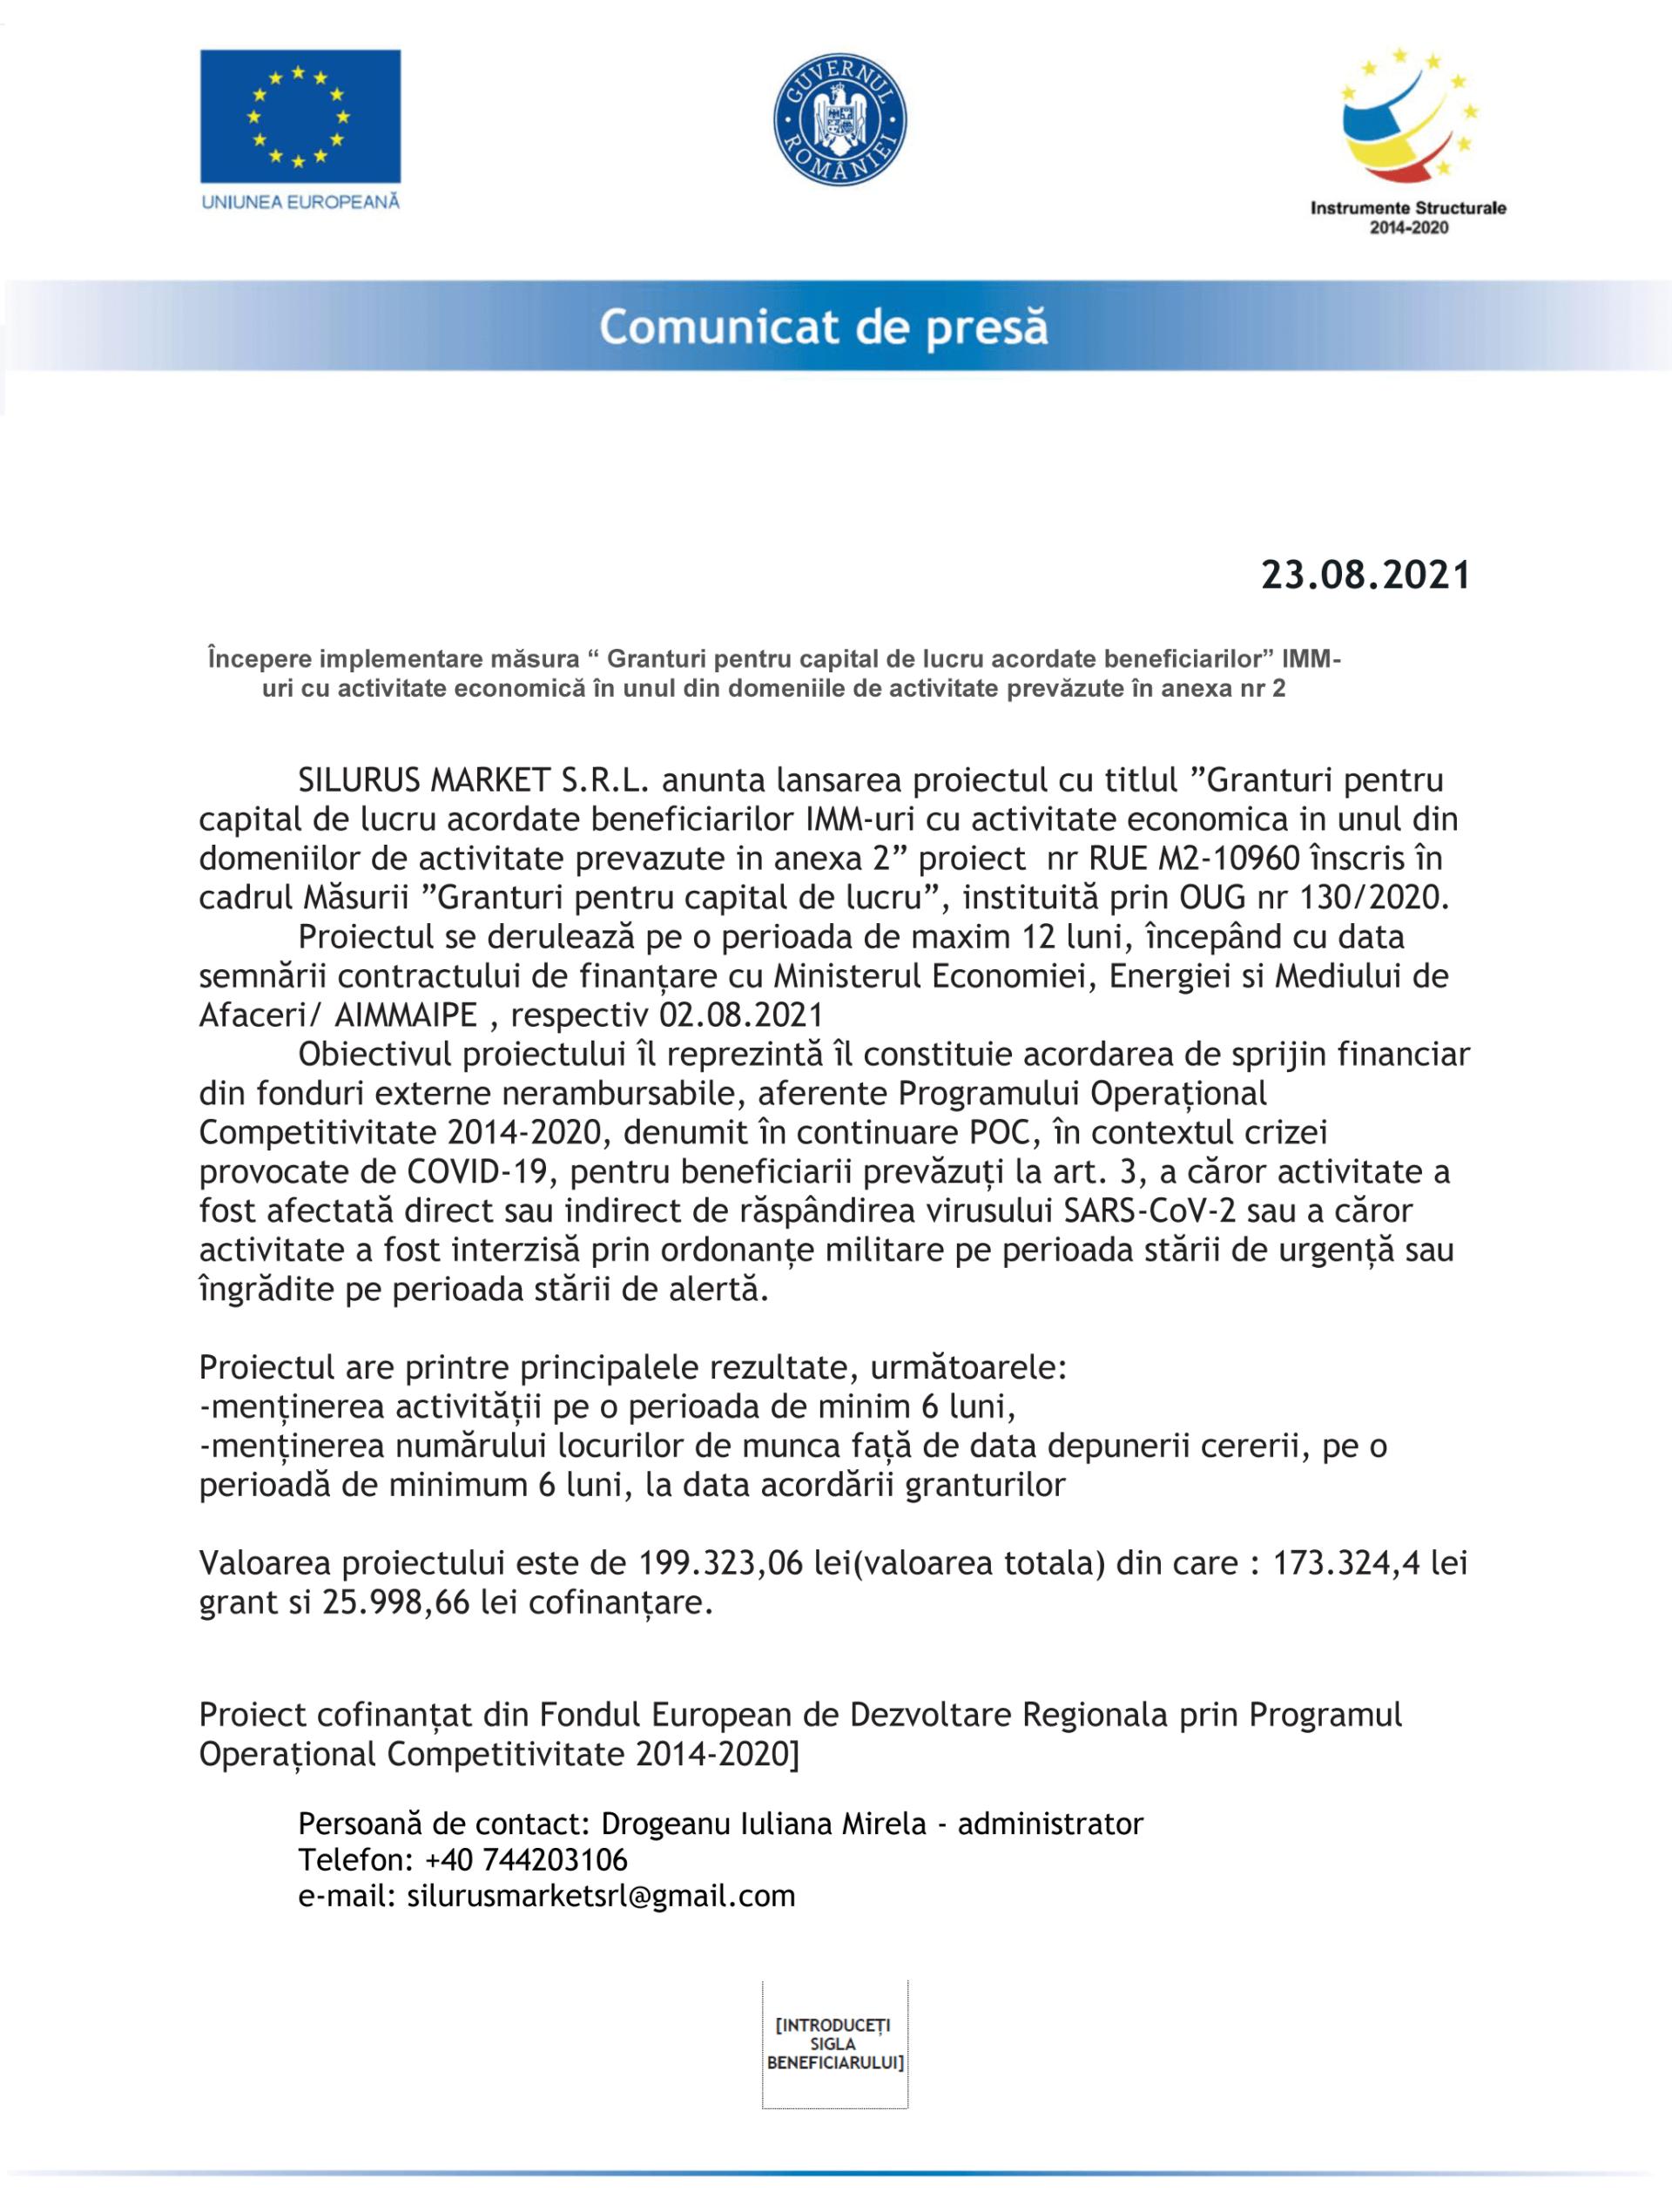 Comunicat_de_Presa_Silurus-Market